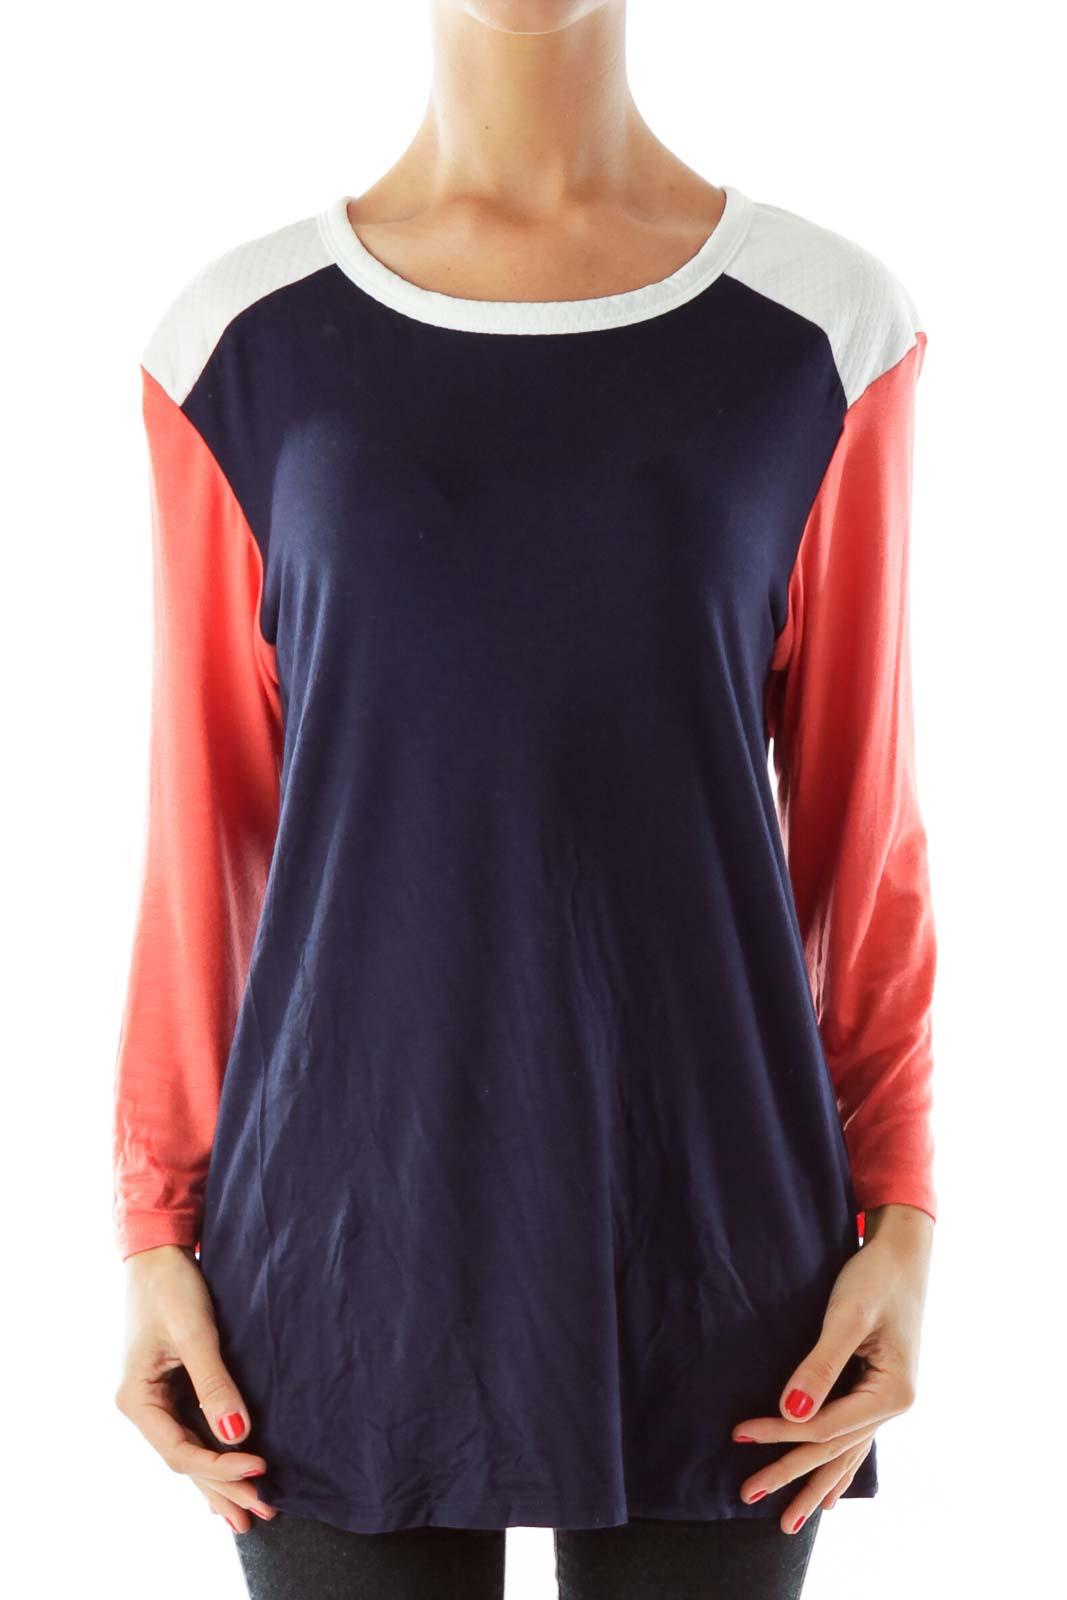 Navy & Coral Color Block Shirt Front